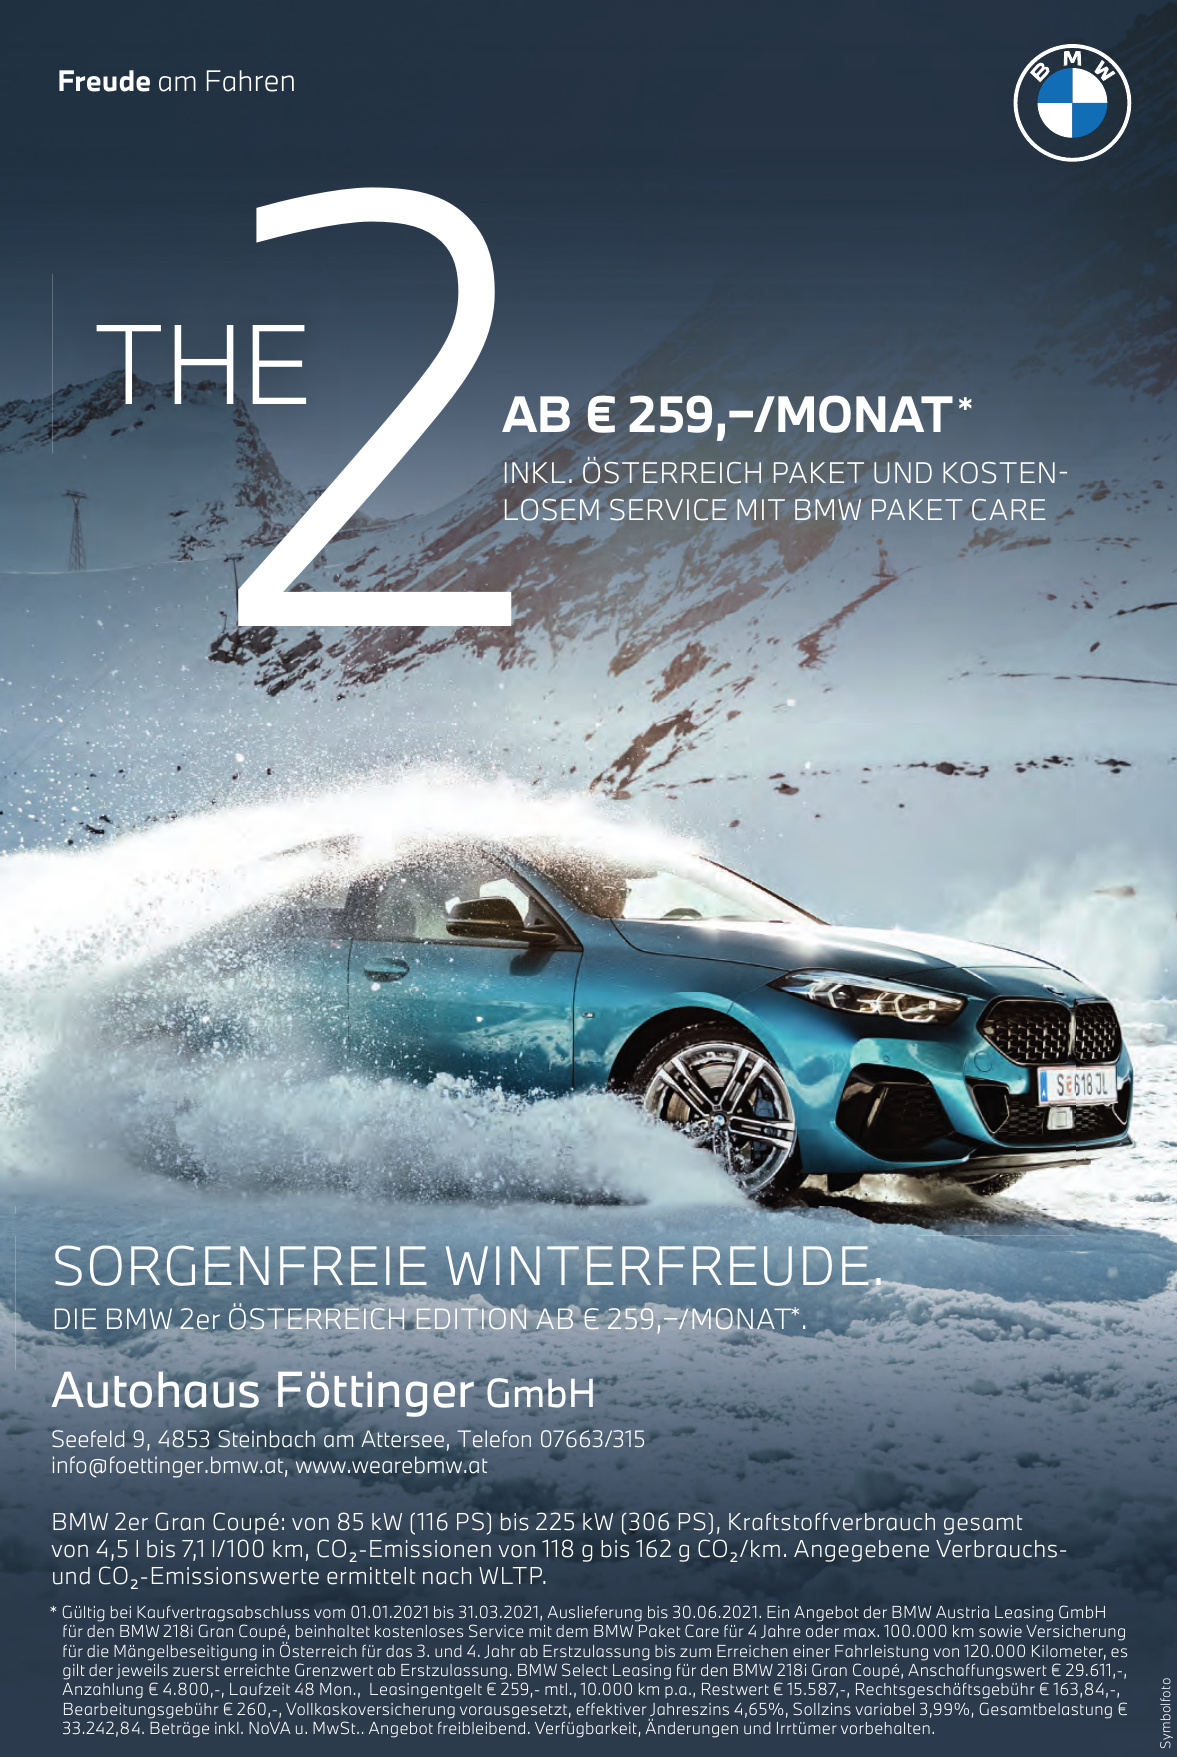 Autohaus Föttinger GmbH